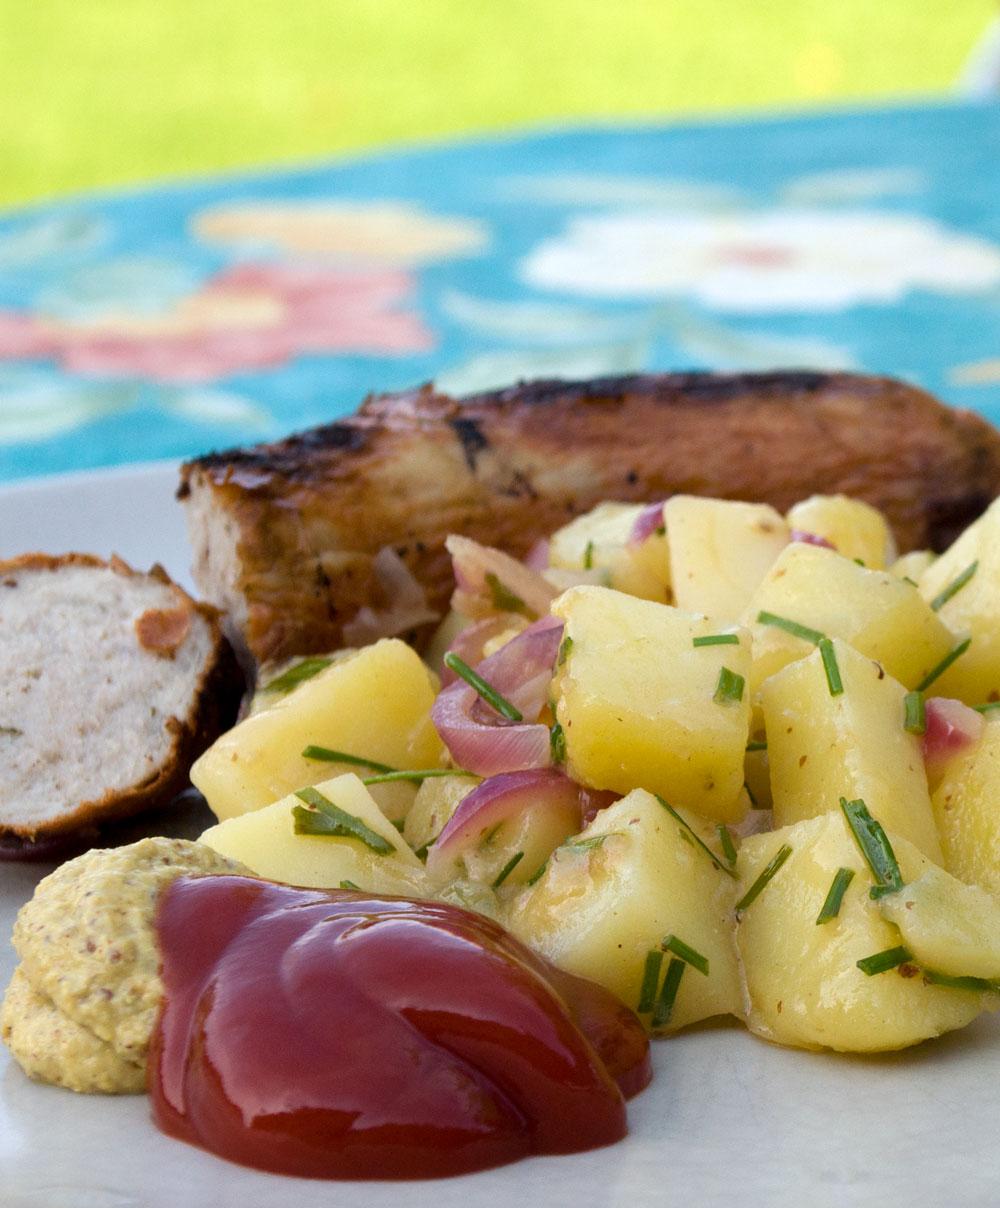 sur-sod-kartoffelsalat-56-2